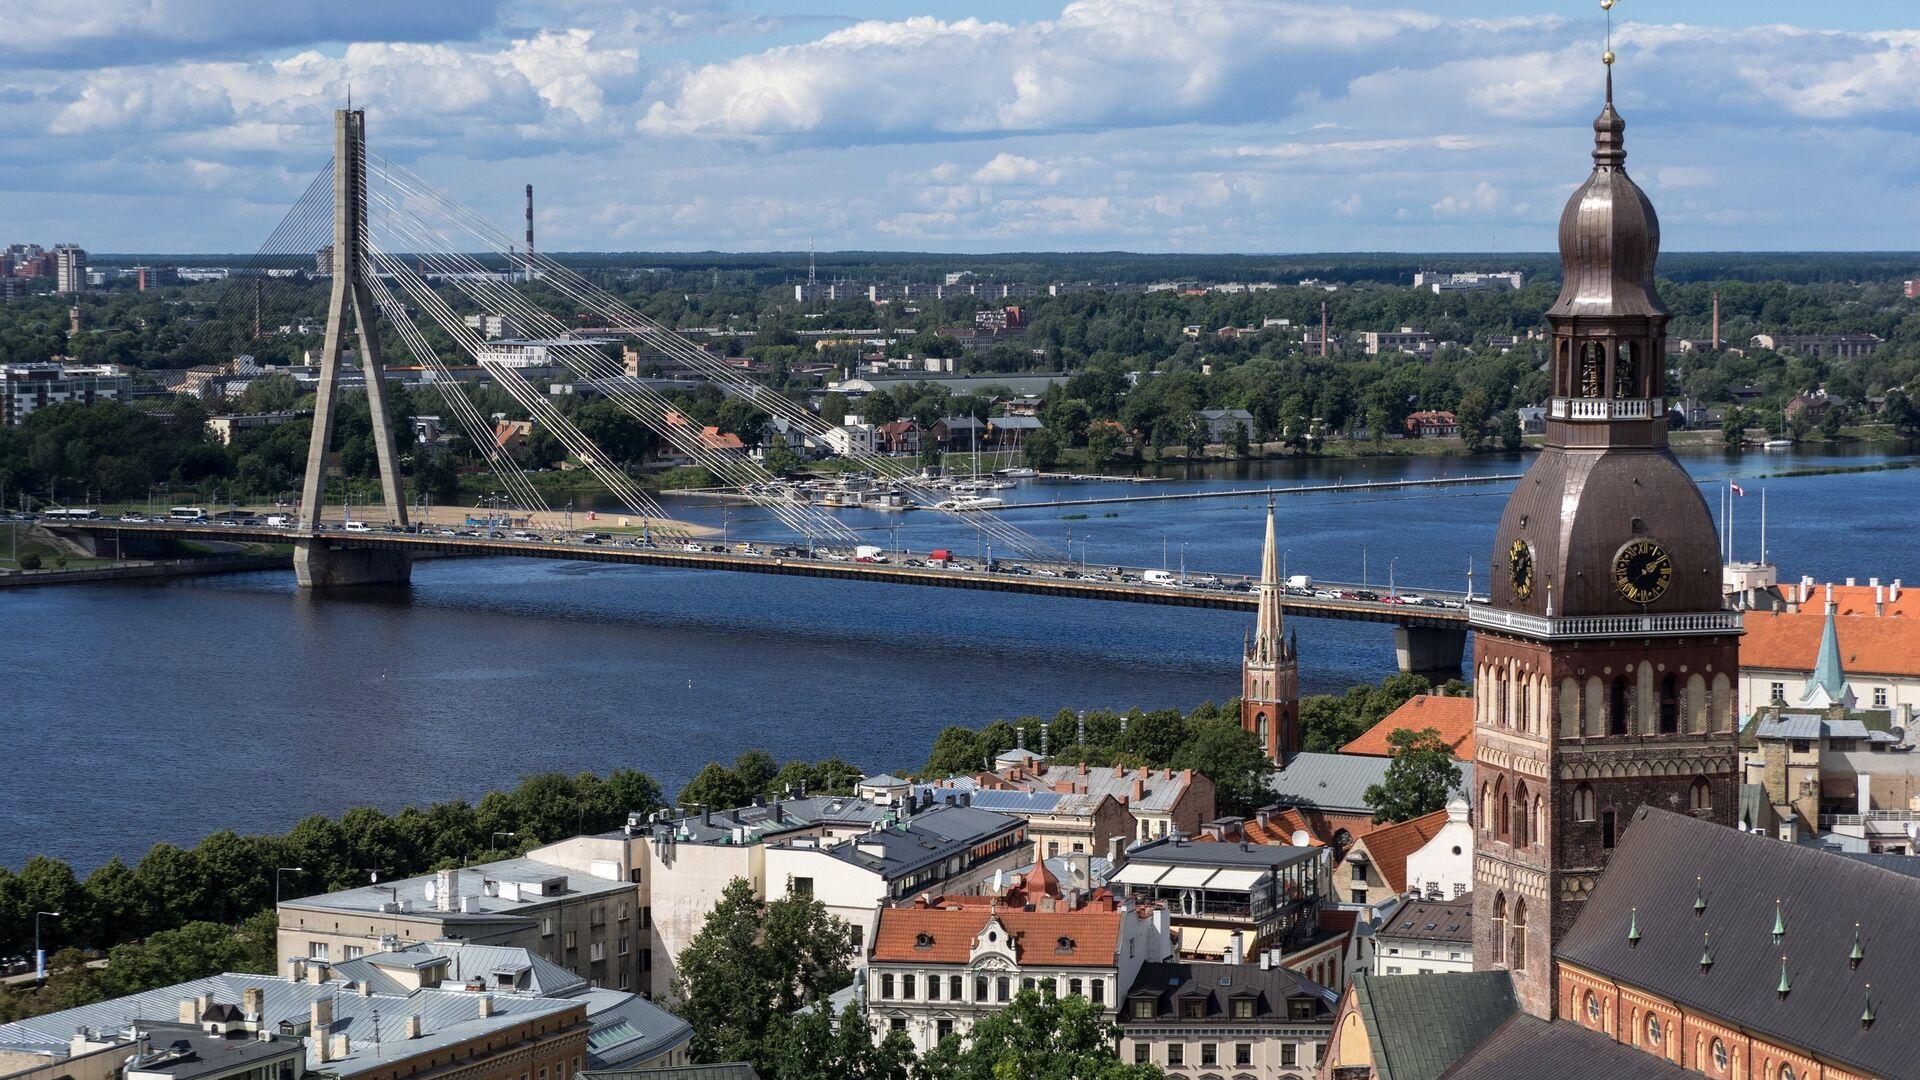 Cities of the world. Riga - Sputnik International, 1920, 15.09.2021